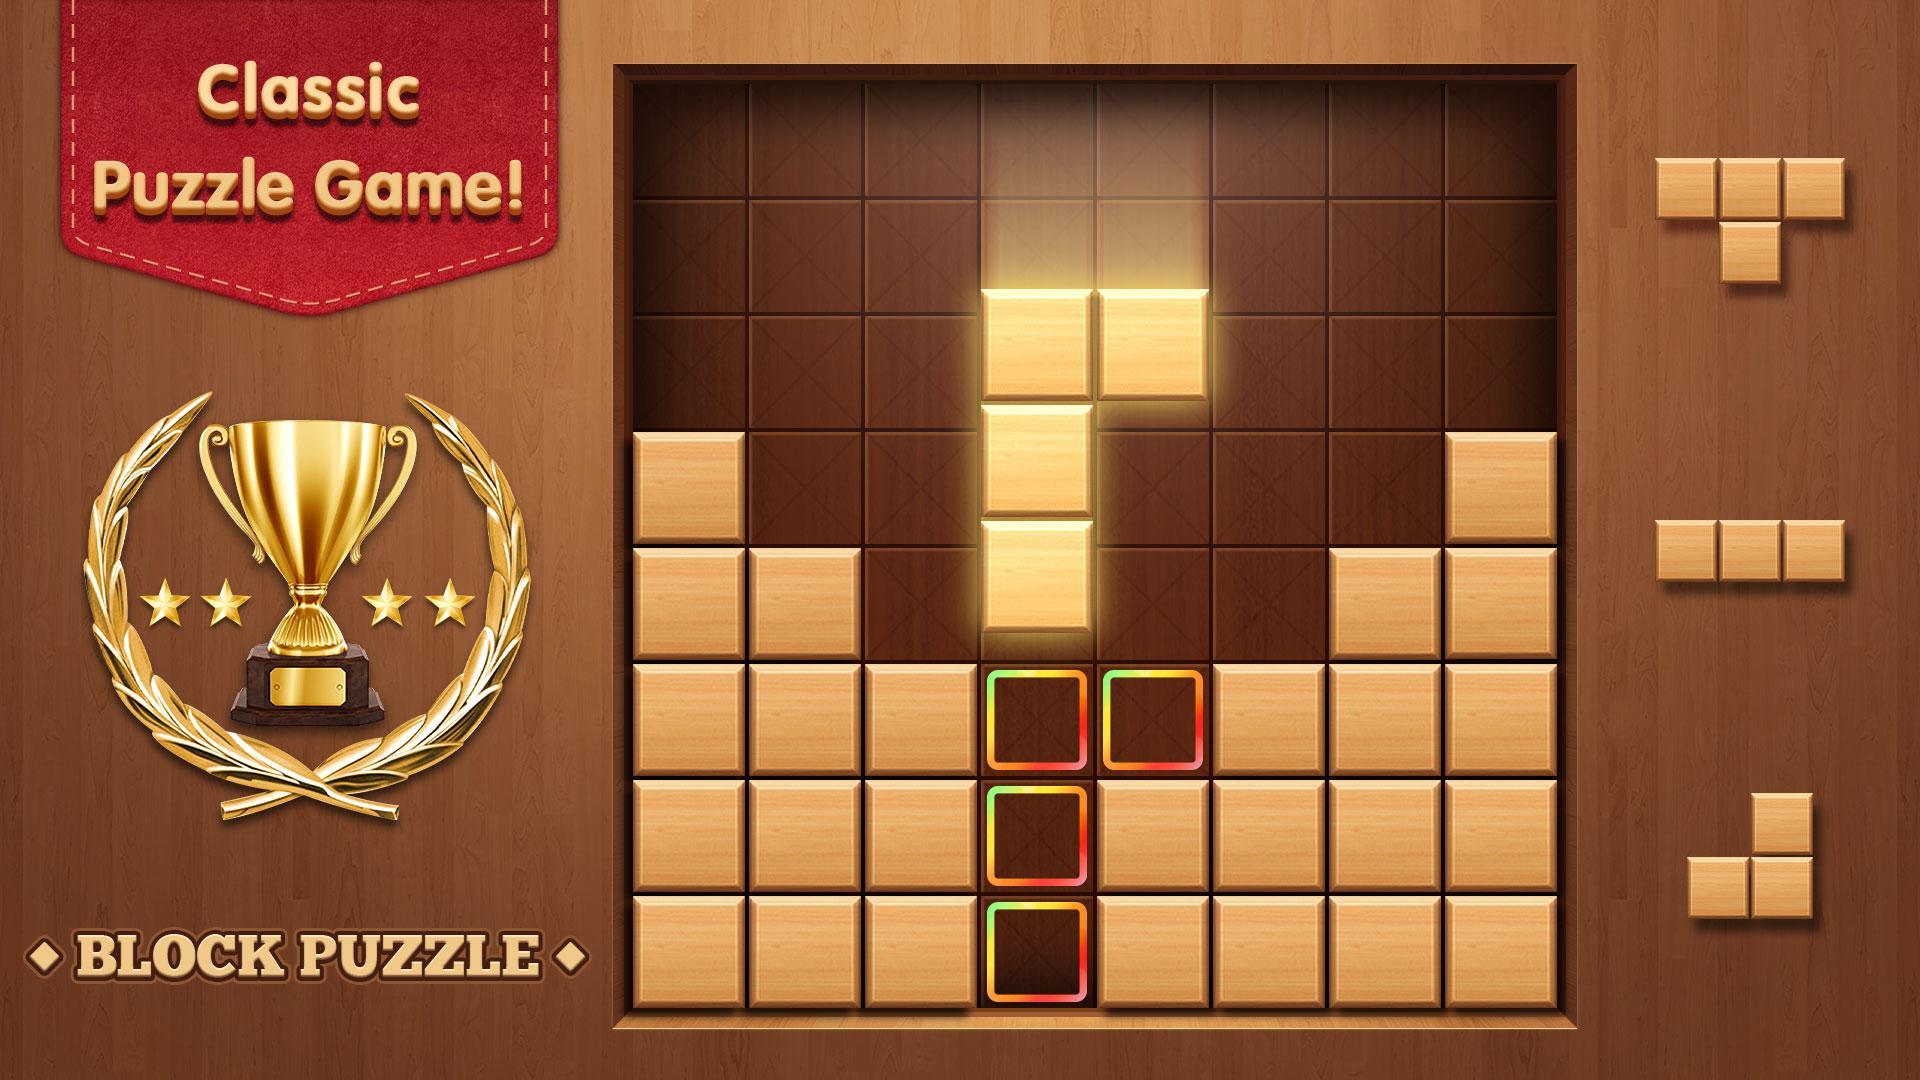 WoodBlockLegend-ClassicPuzzleGame 1.1.2 Screenshot 1